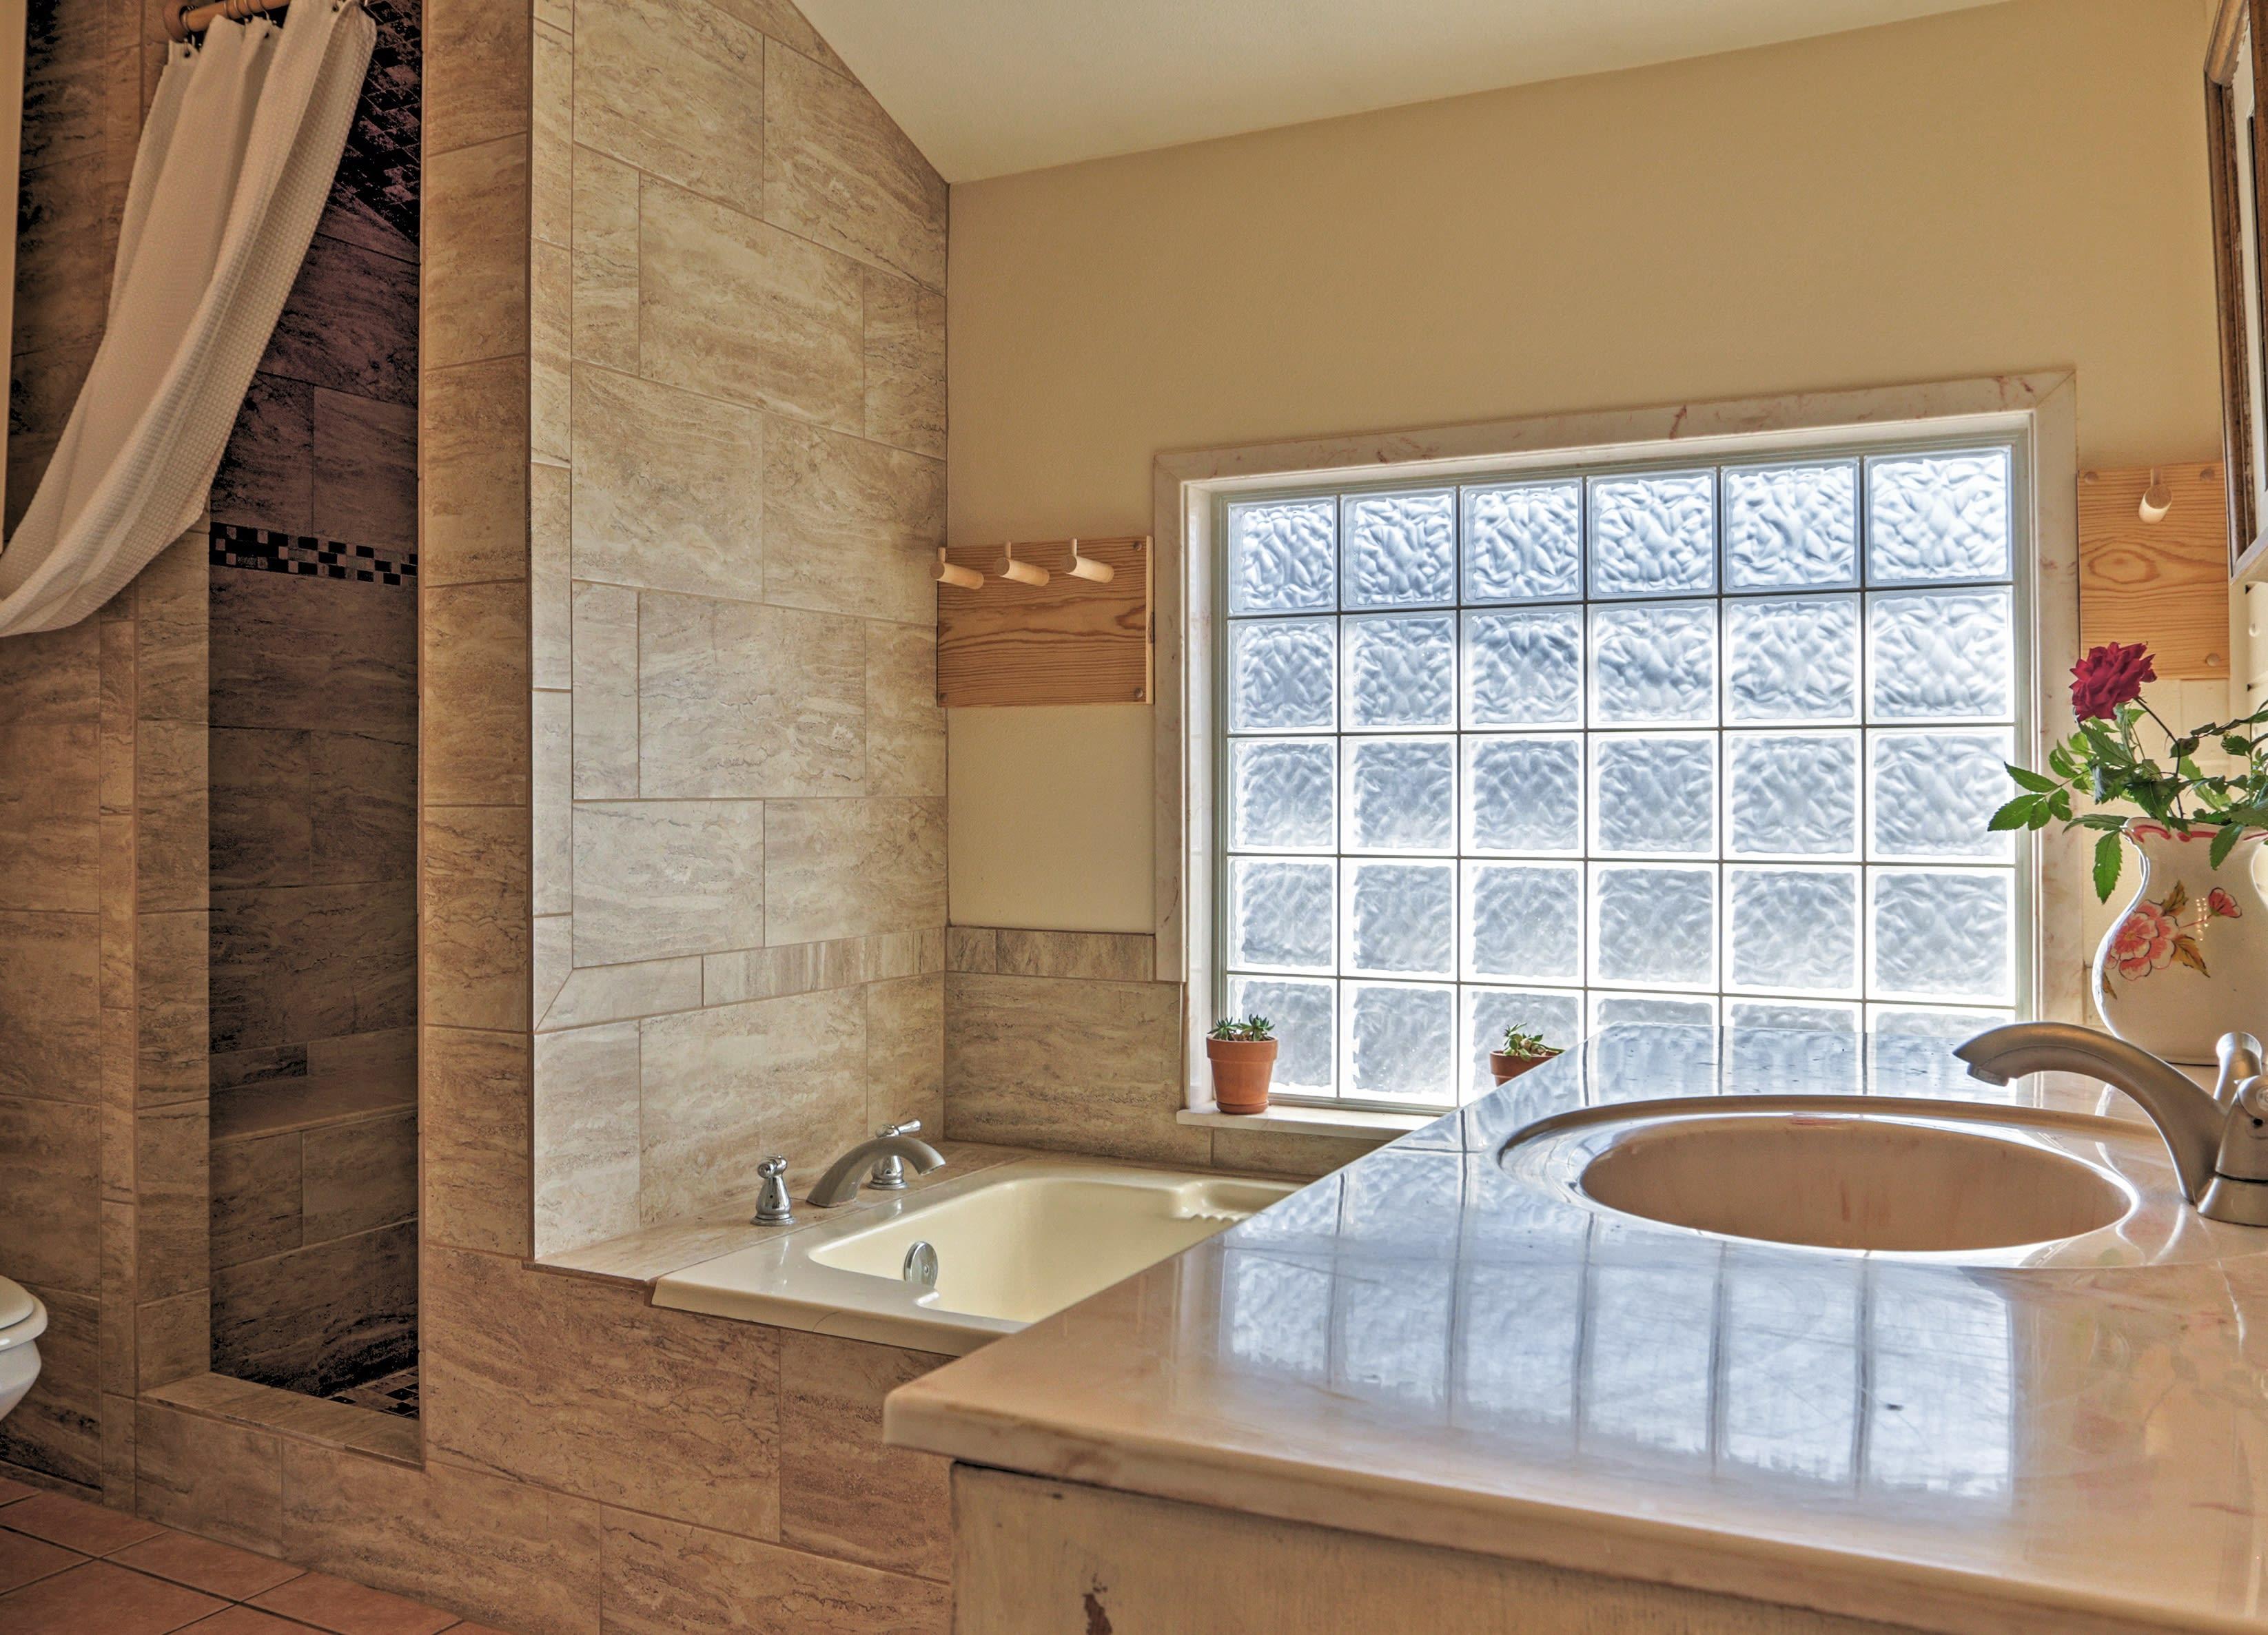 En-Suite Full Bathroom | Towels Provided | Complimentary Toiletries